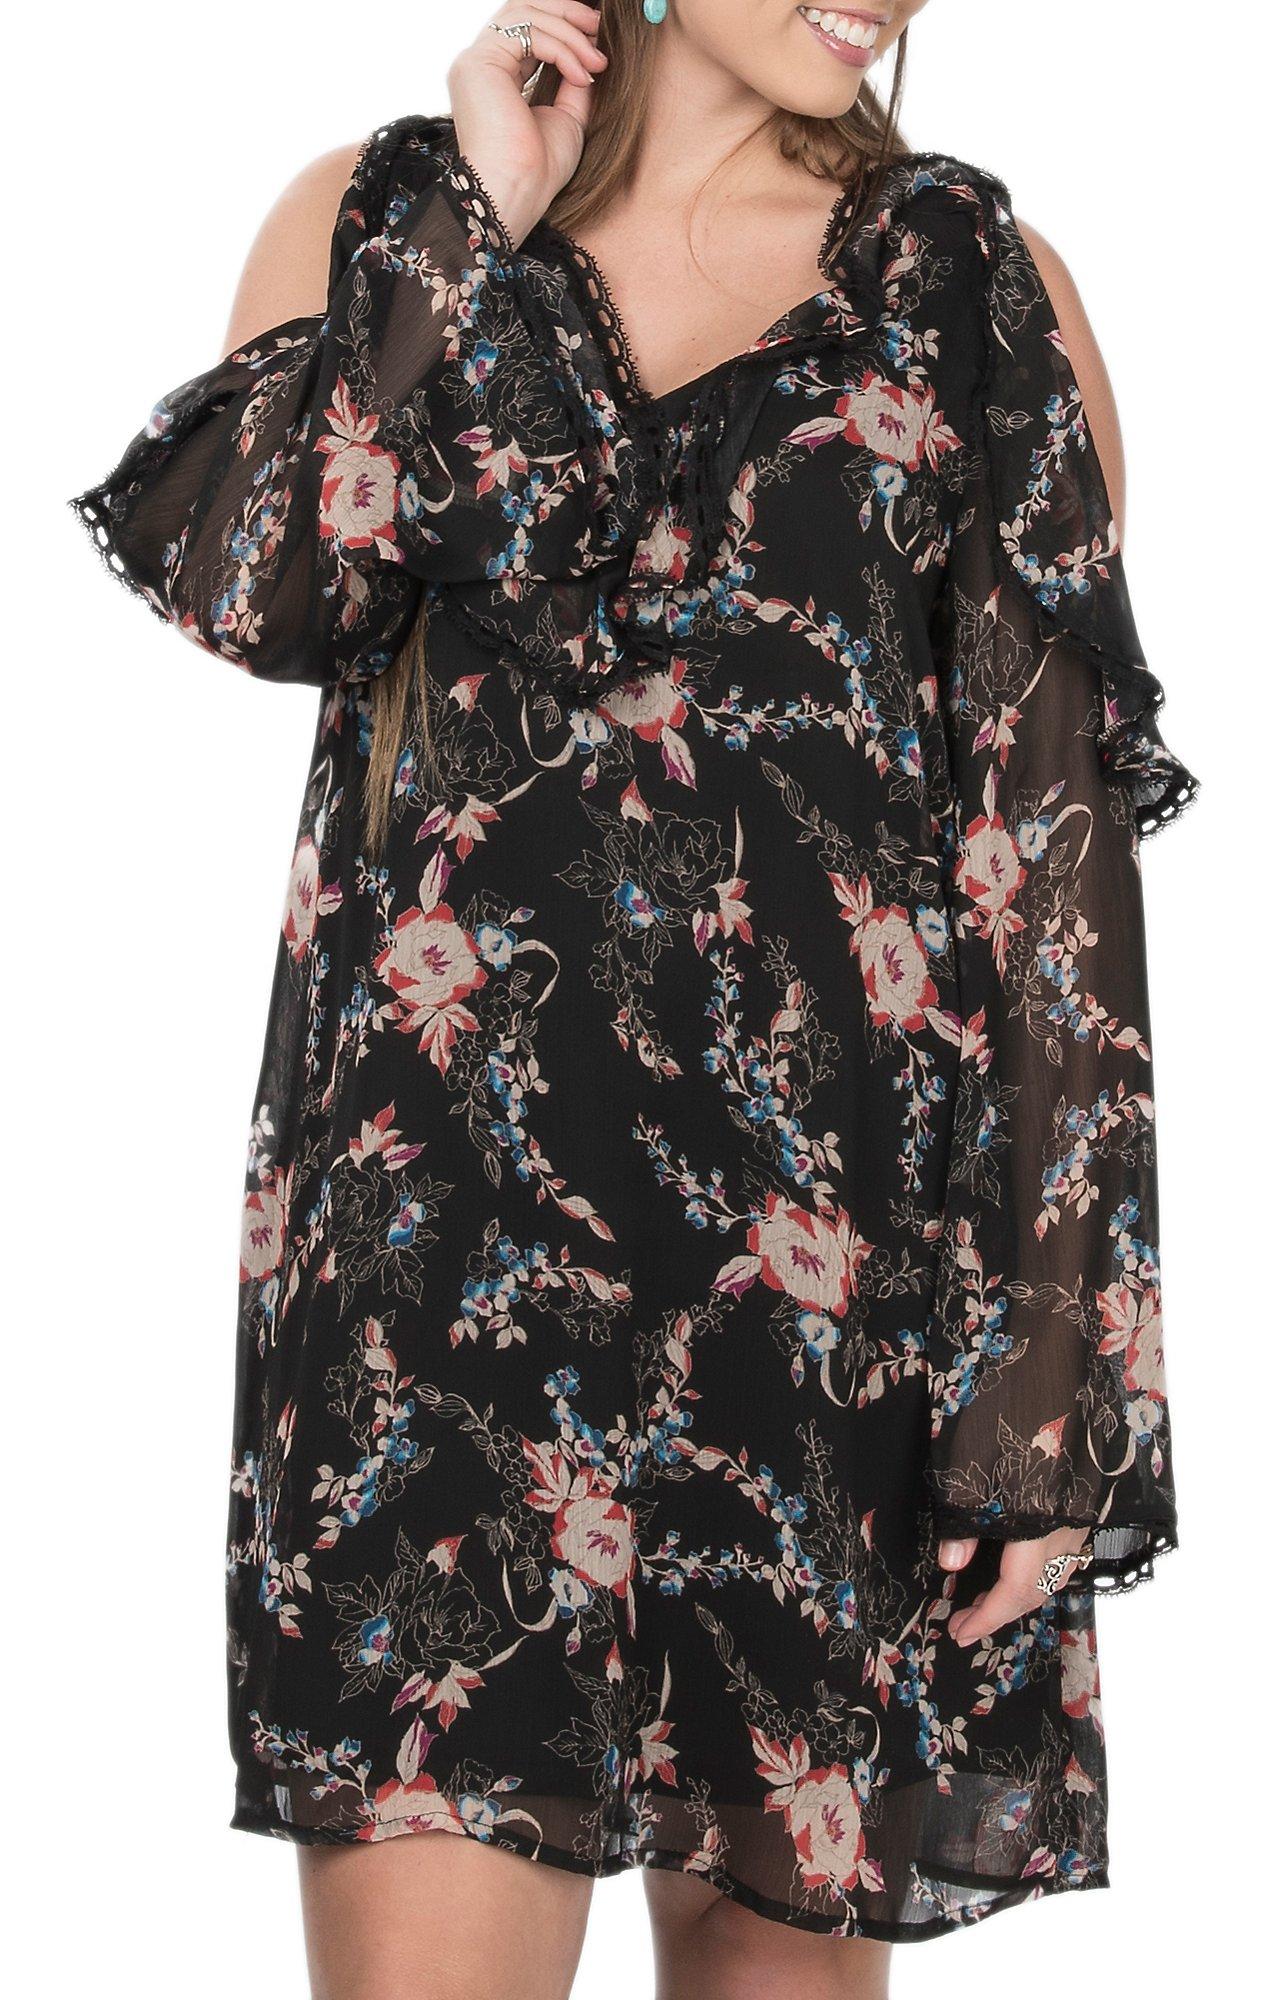 Flying Tomato Womens Black Floral Print Cold Shoulder Long Sleeve